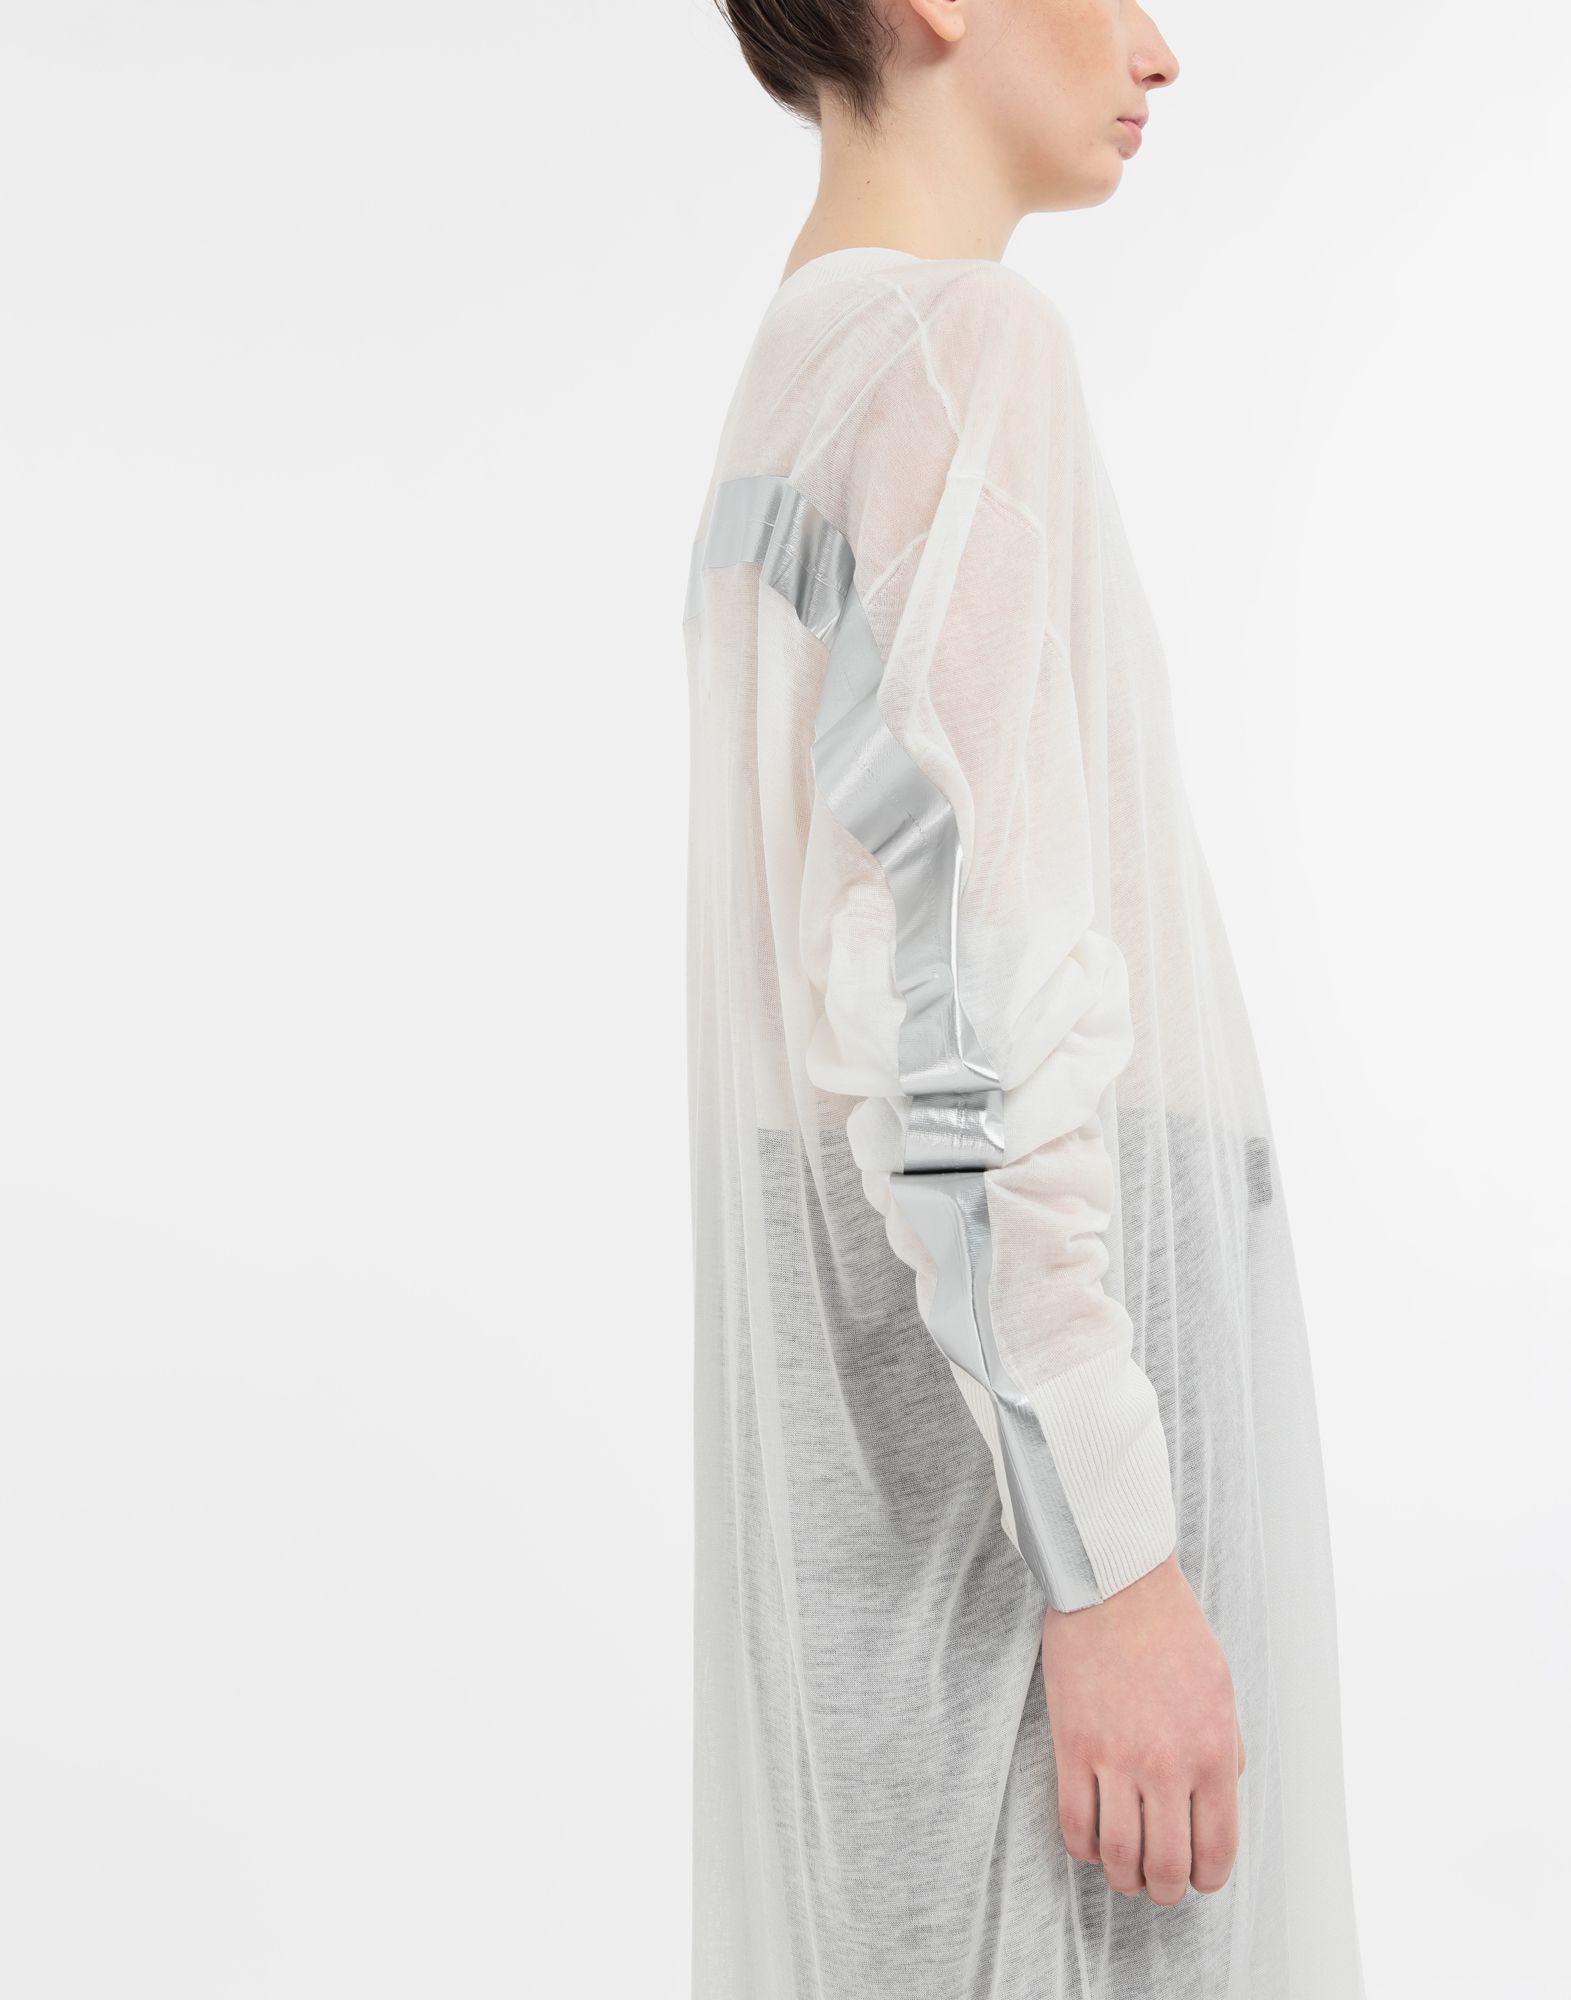 MAISON MARGIELA Knitwear Tape-bonded knit pullover V-neck Woman a